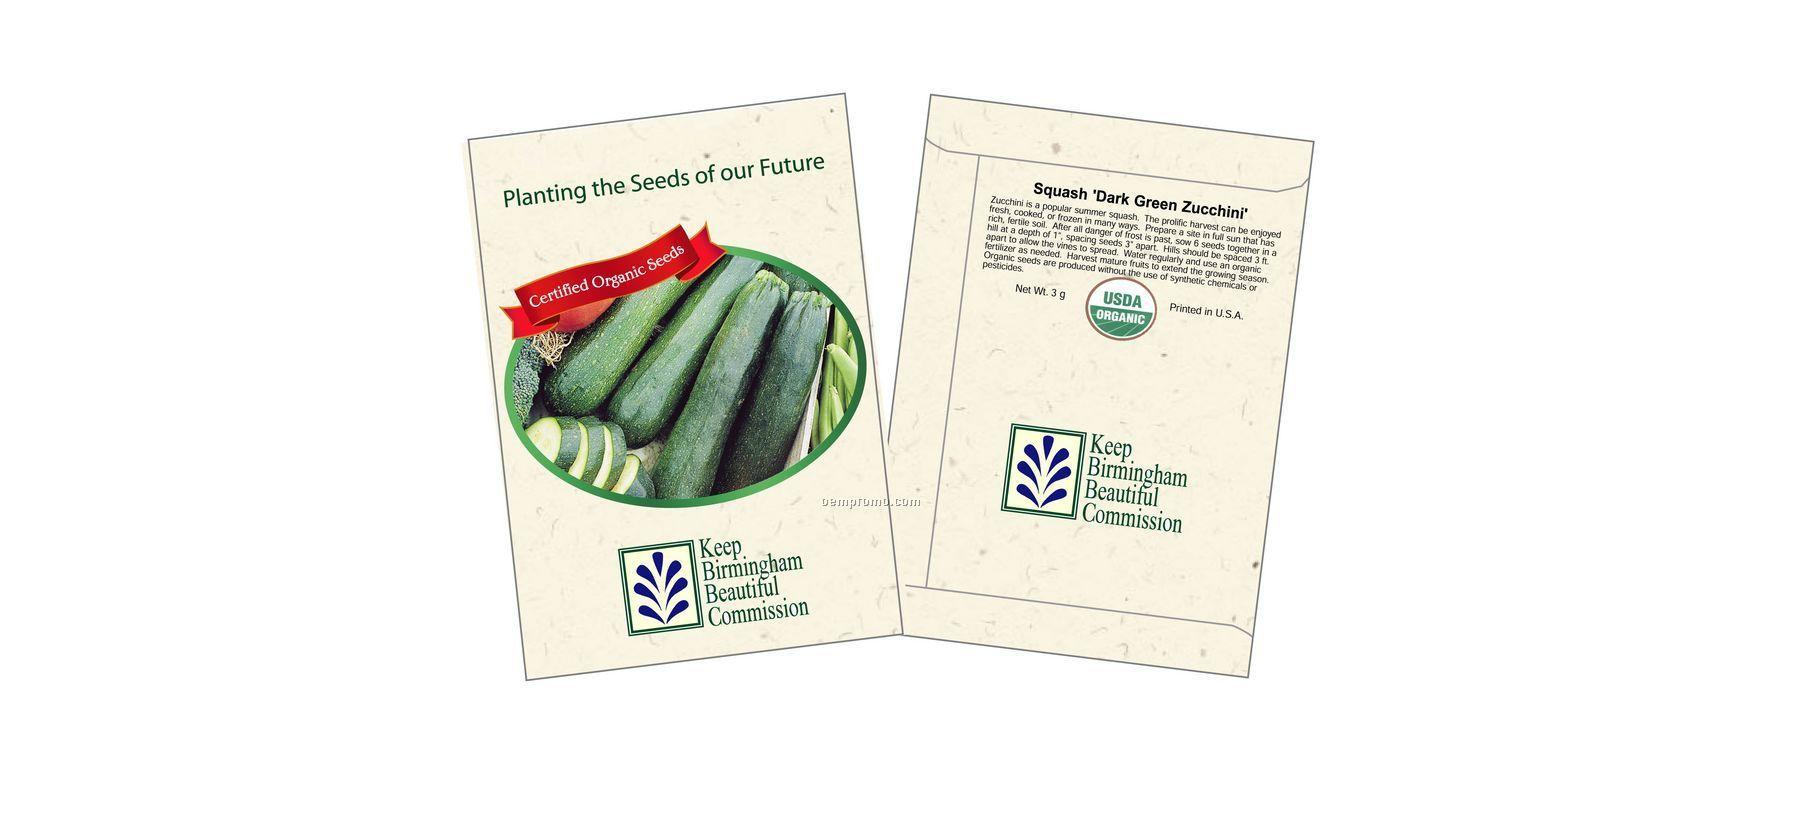 Organic Squash - Dark Green Zucchini Seed Packets (1 Color)